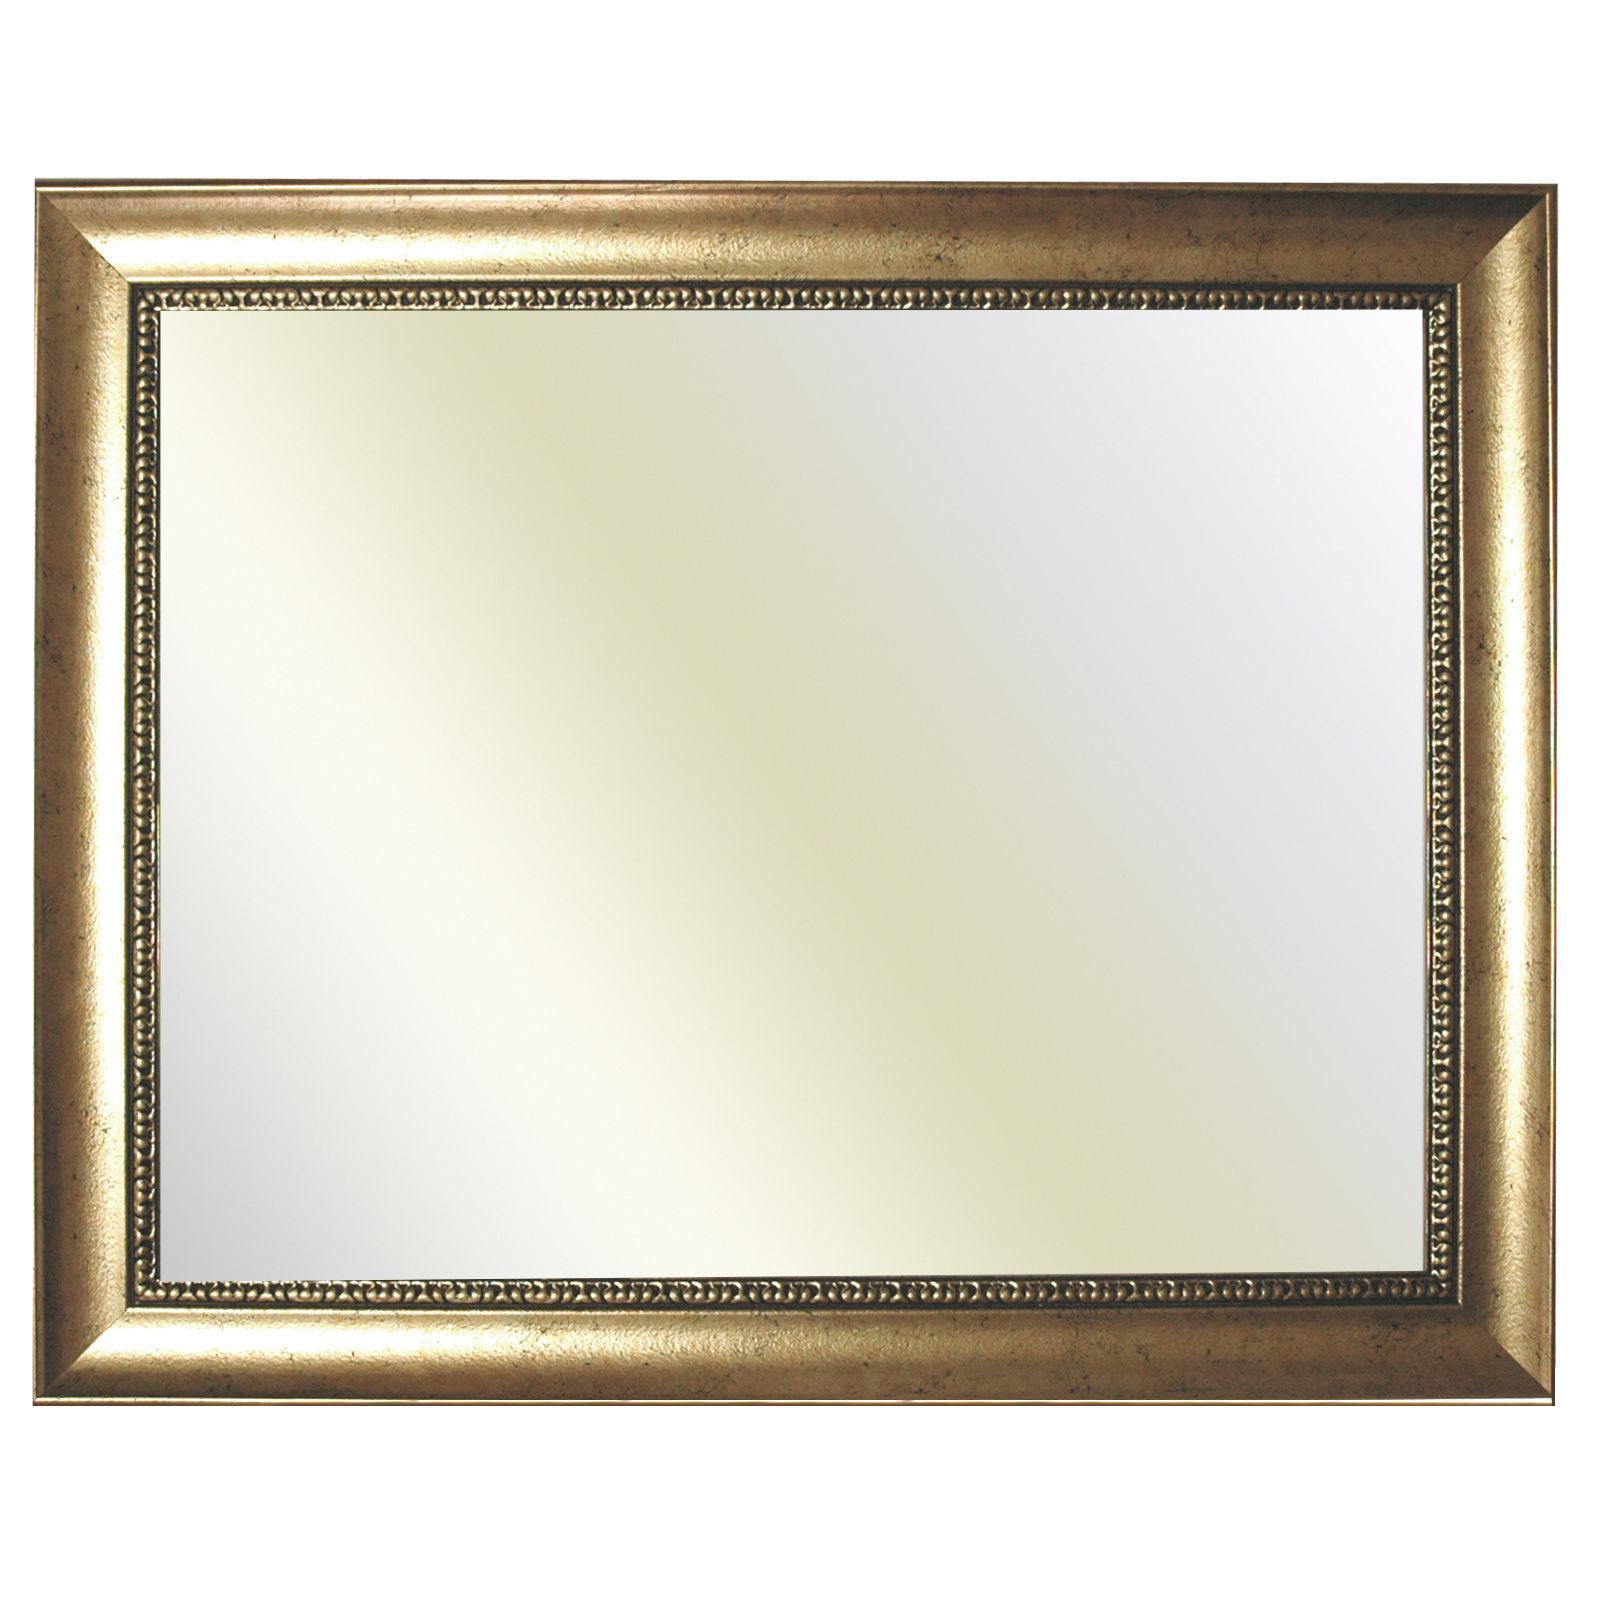 Cornice BAROCCO platino finemente decorata 246 PLAT, diverse varianti varianti varianti 2700ed